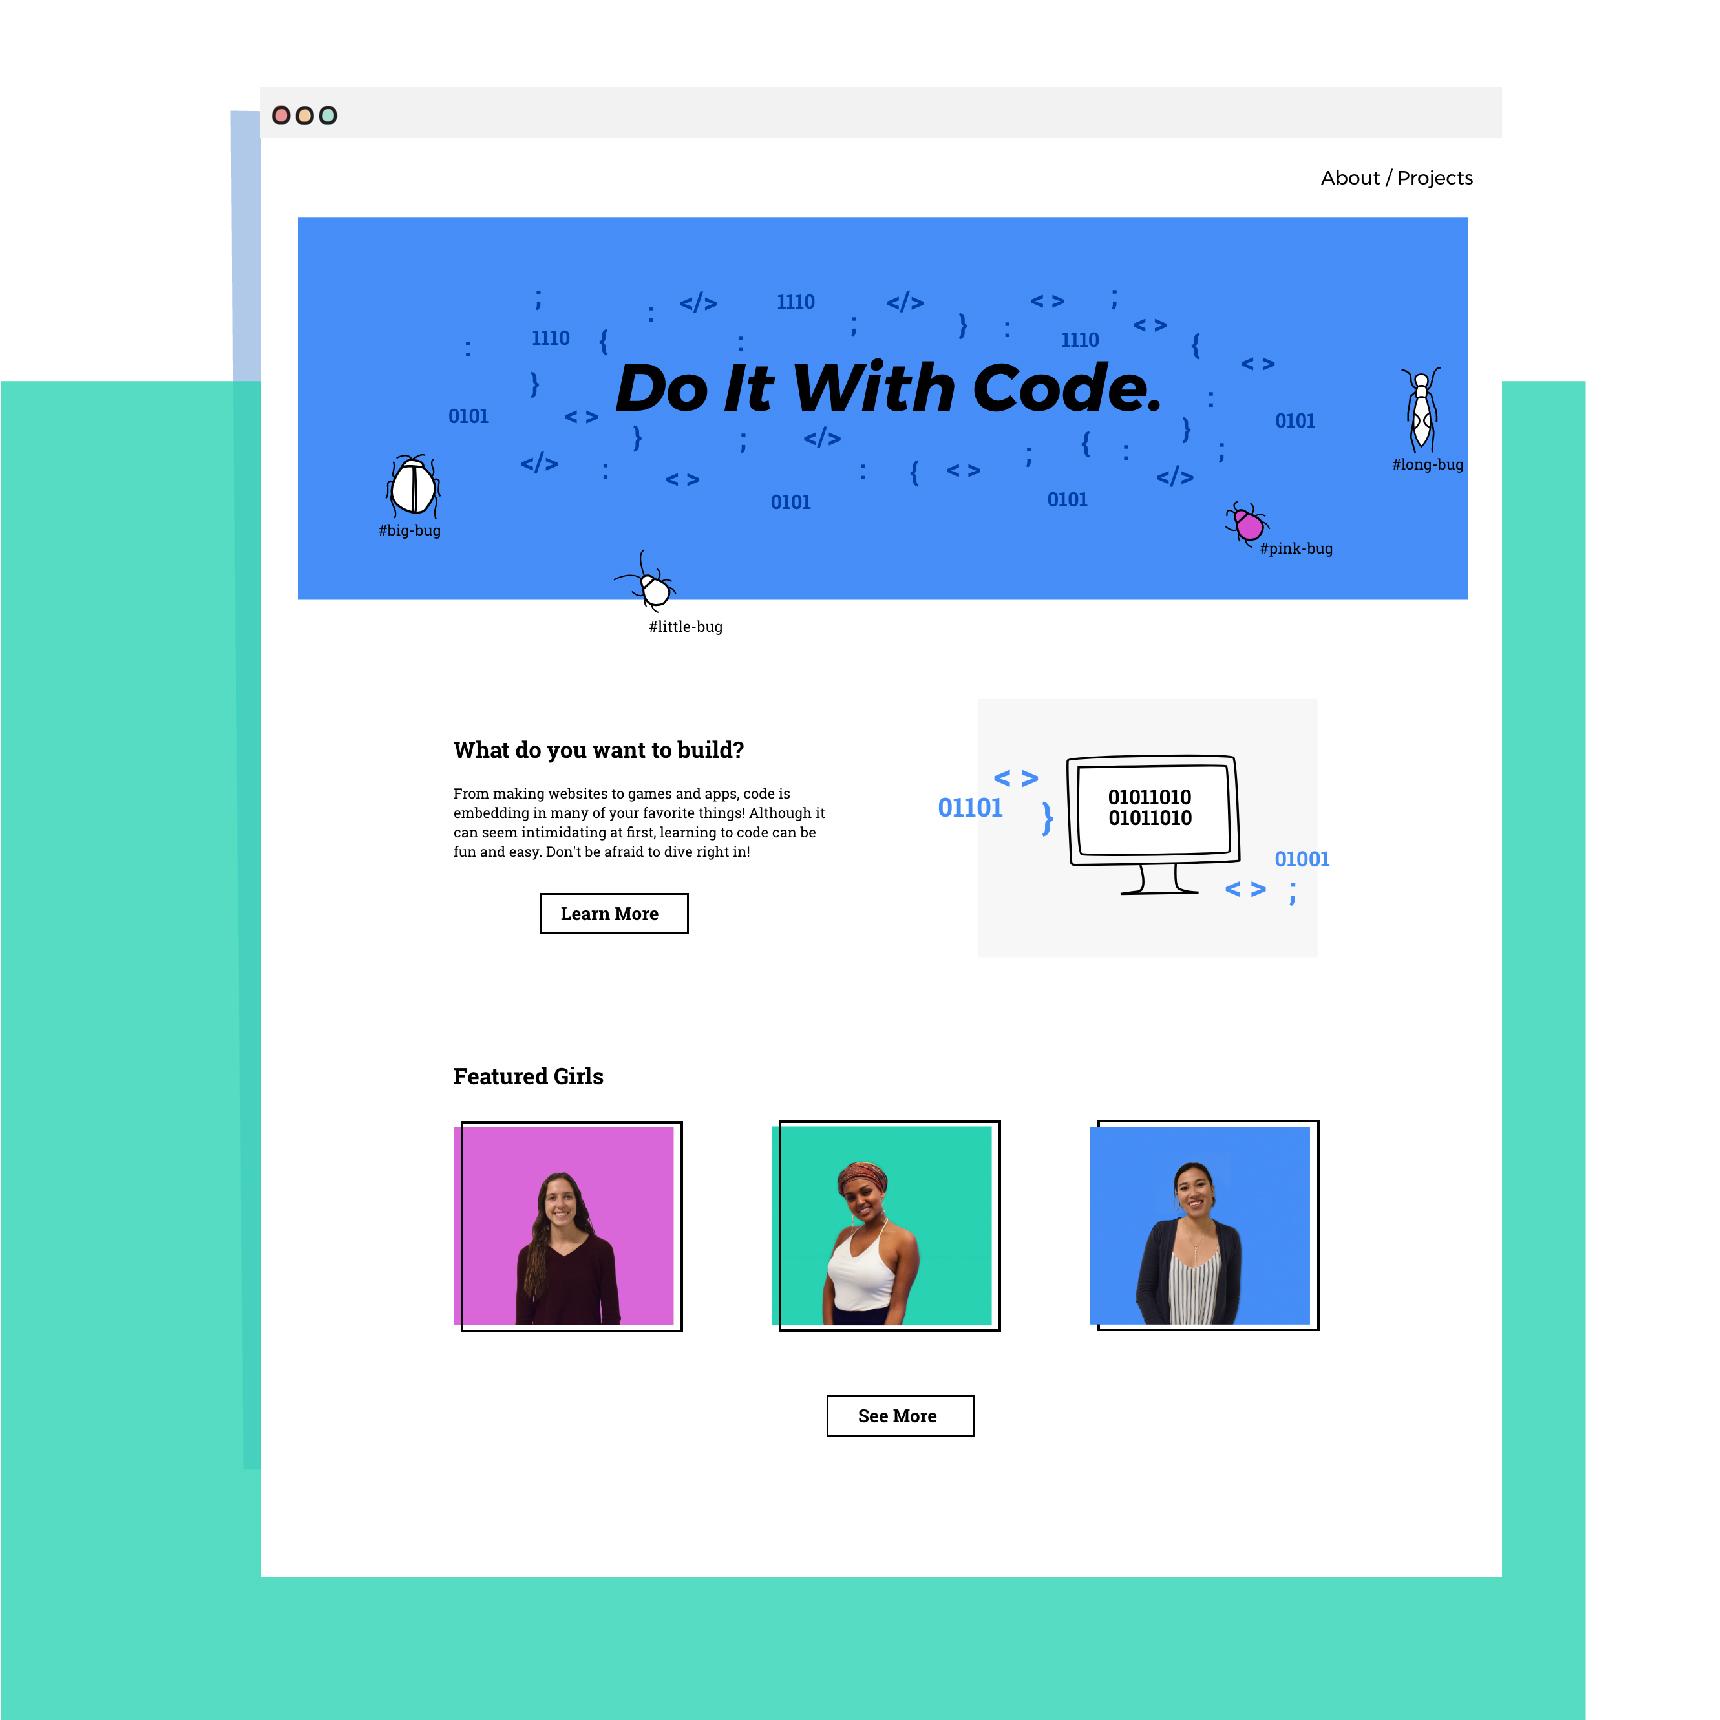 <i>Do It With Code</i>